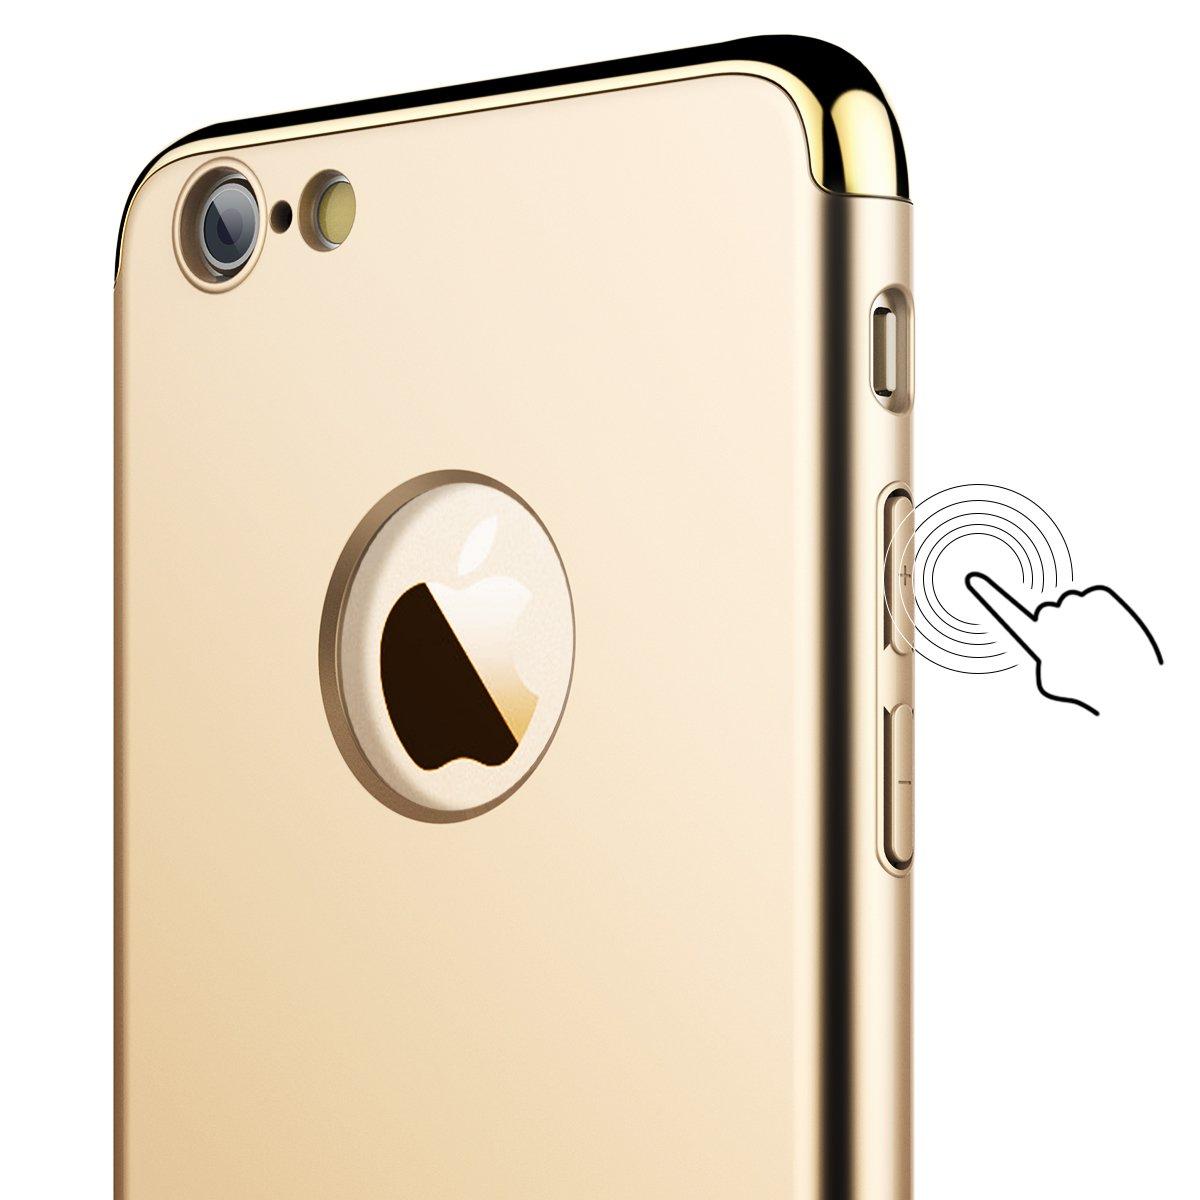 Vemmore Iphone 6s Plus Hlle 6 Hard Handyhlle Case Matte Full Protective For Golden Ultra Slim Dnn 360 Hardcase